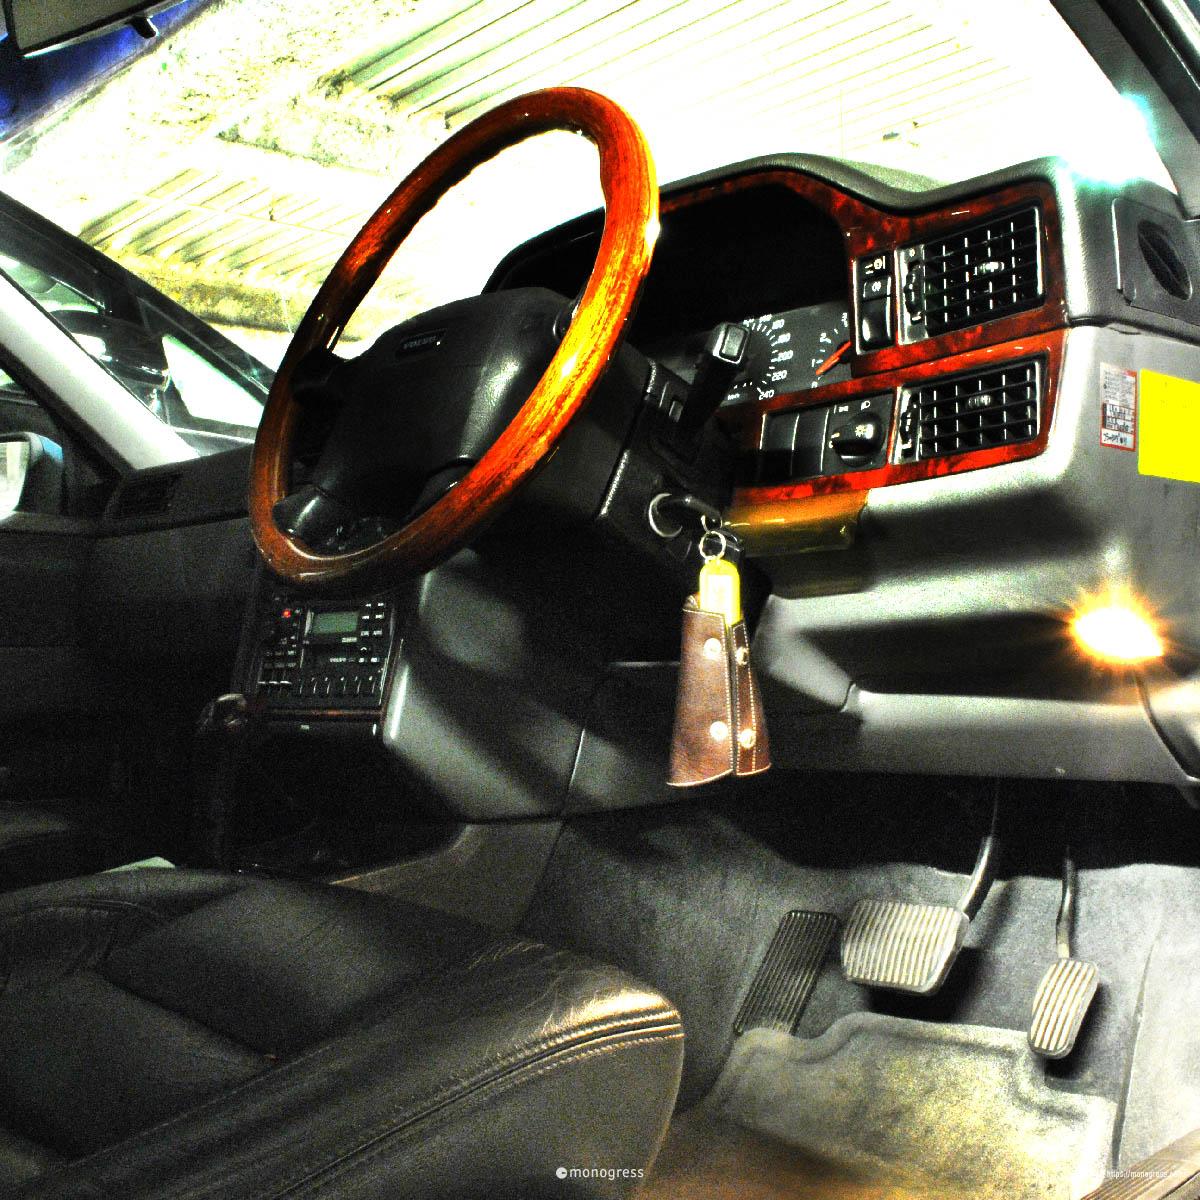 VOLVO 740 Cockpit